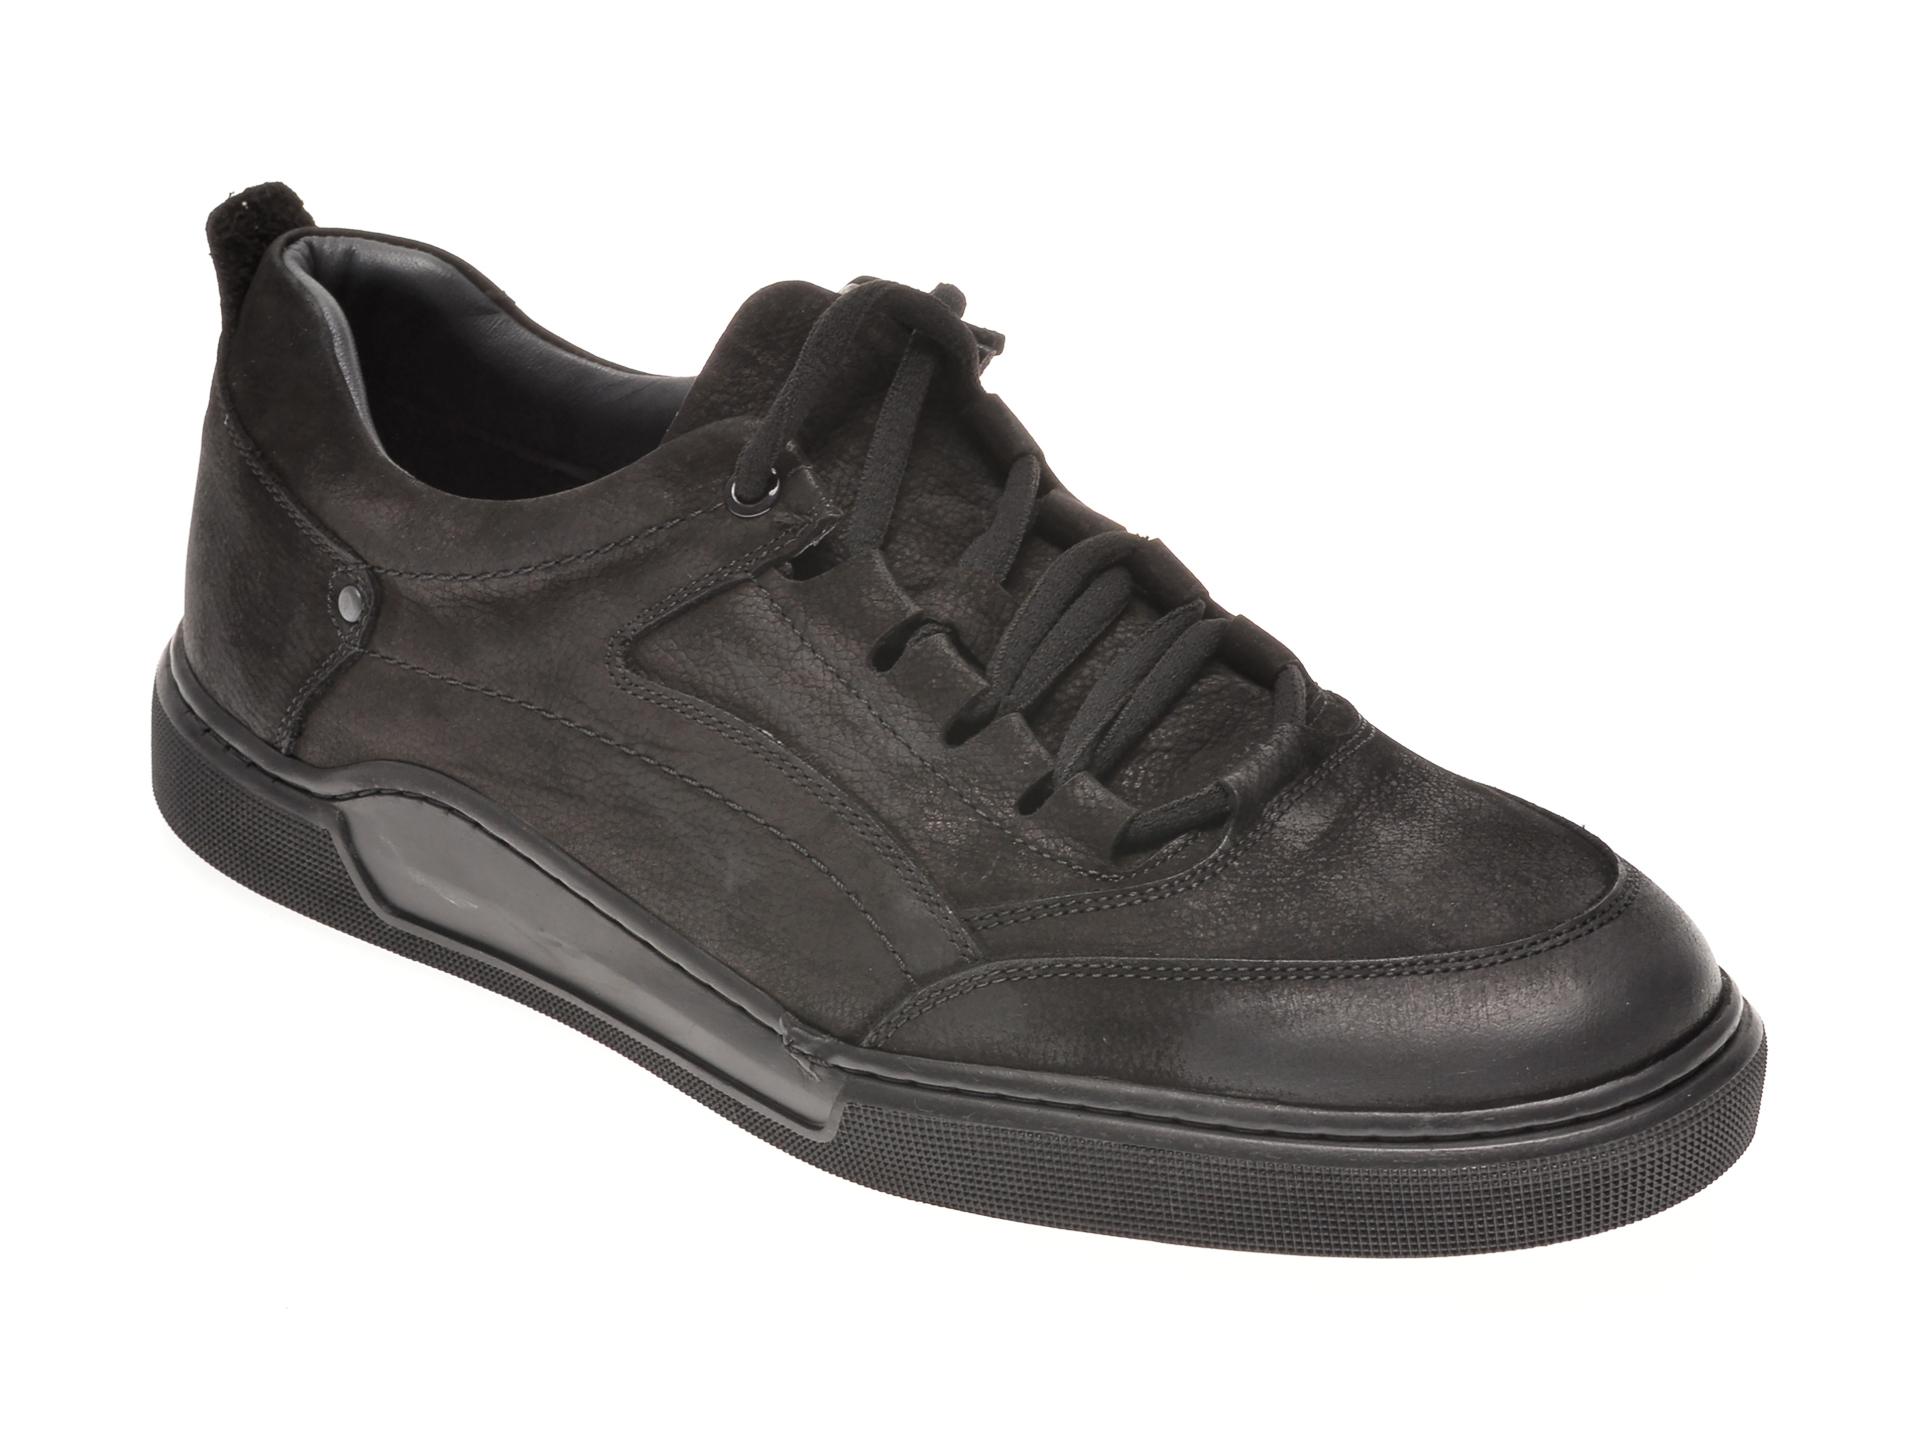 Pantofi Otter Negri, 48707, Din Nabuc